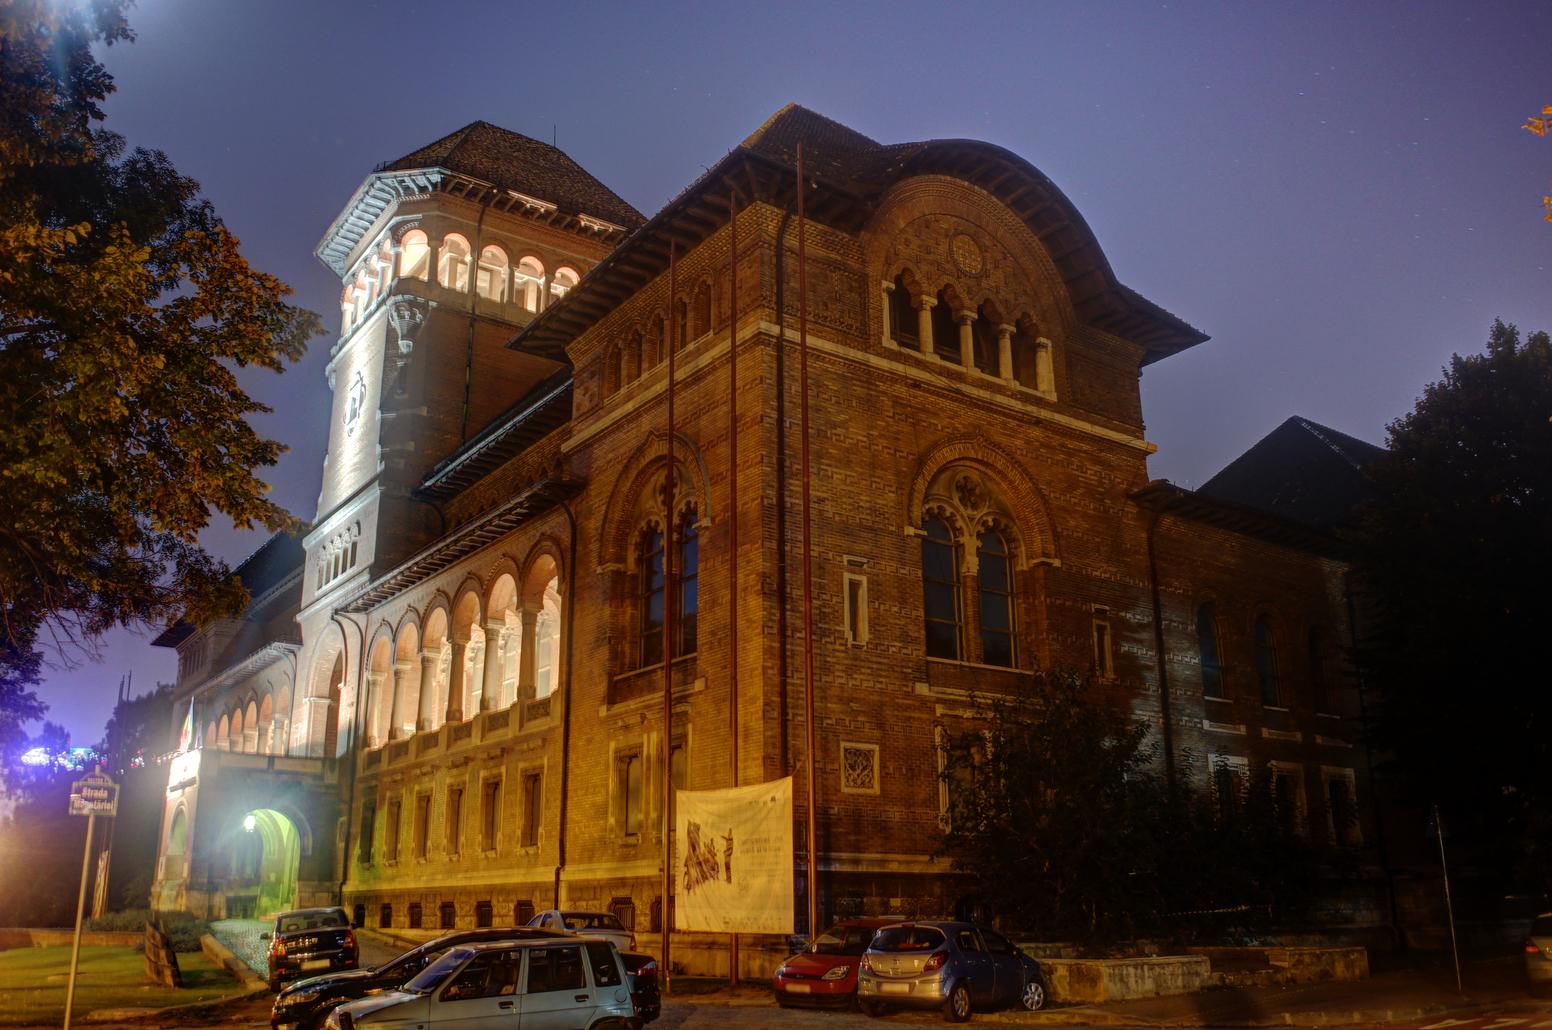 Muzeul_Taranului_Roman_night_HDR